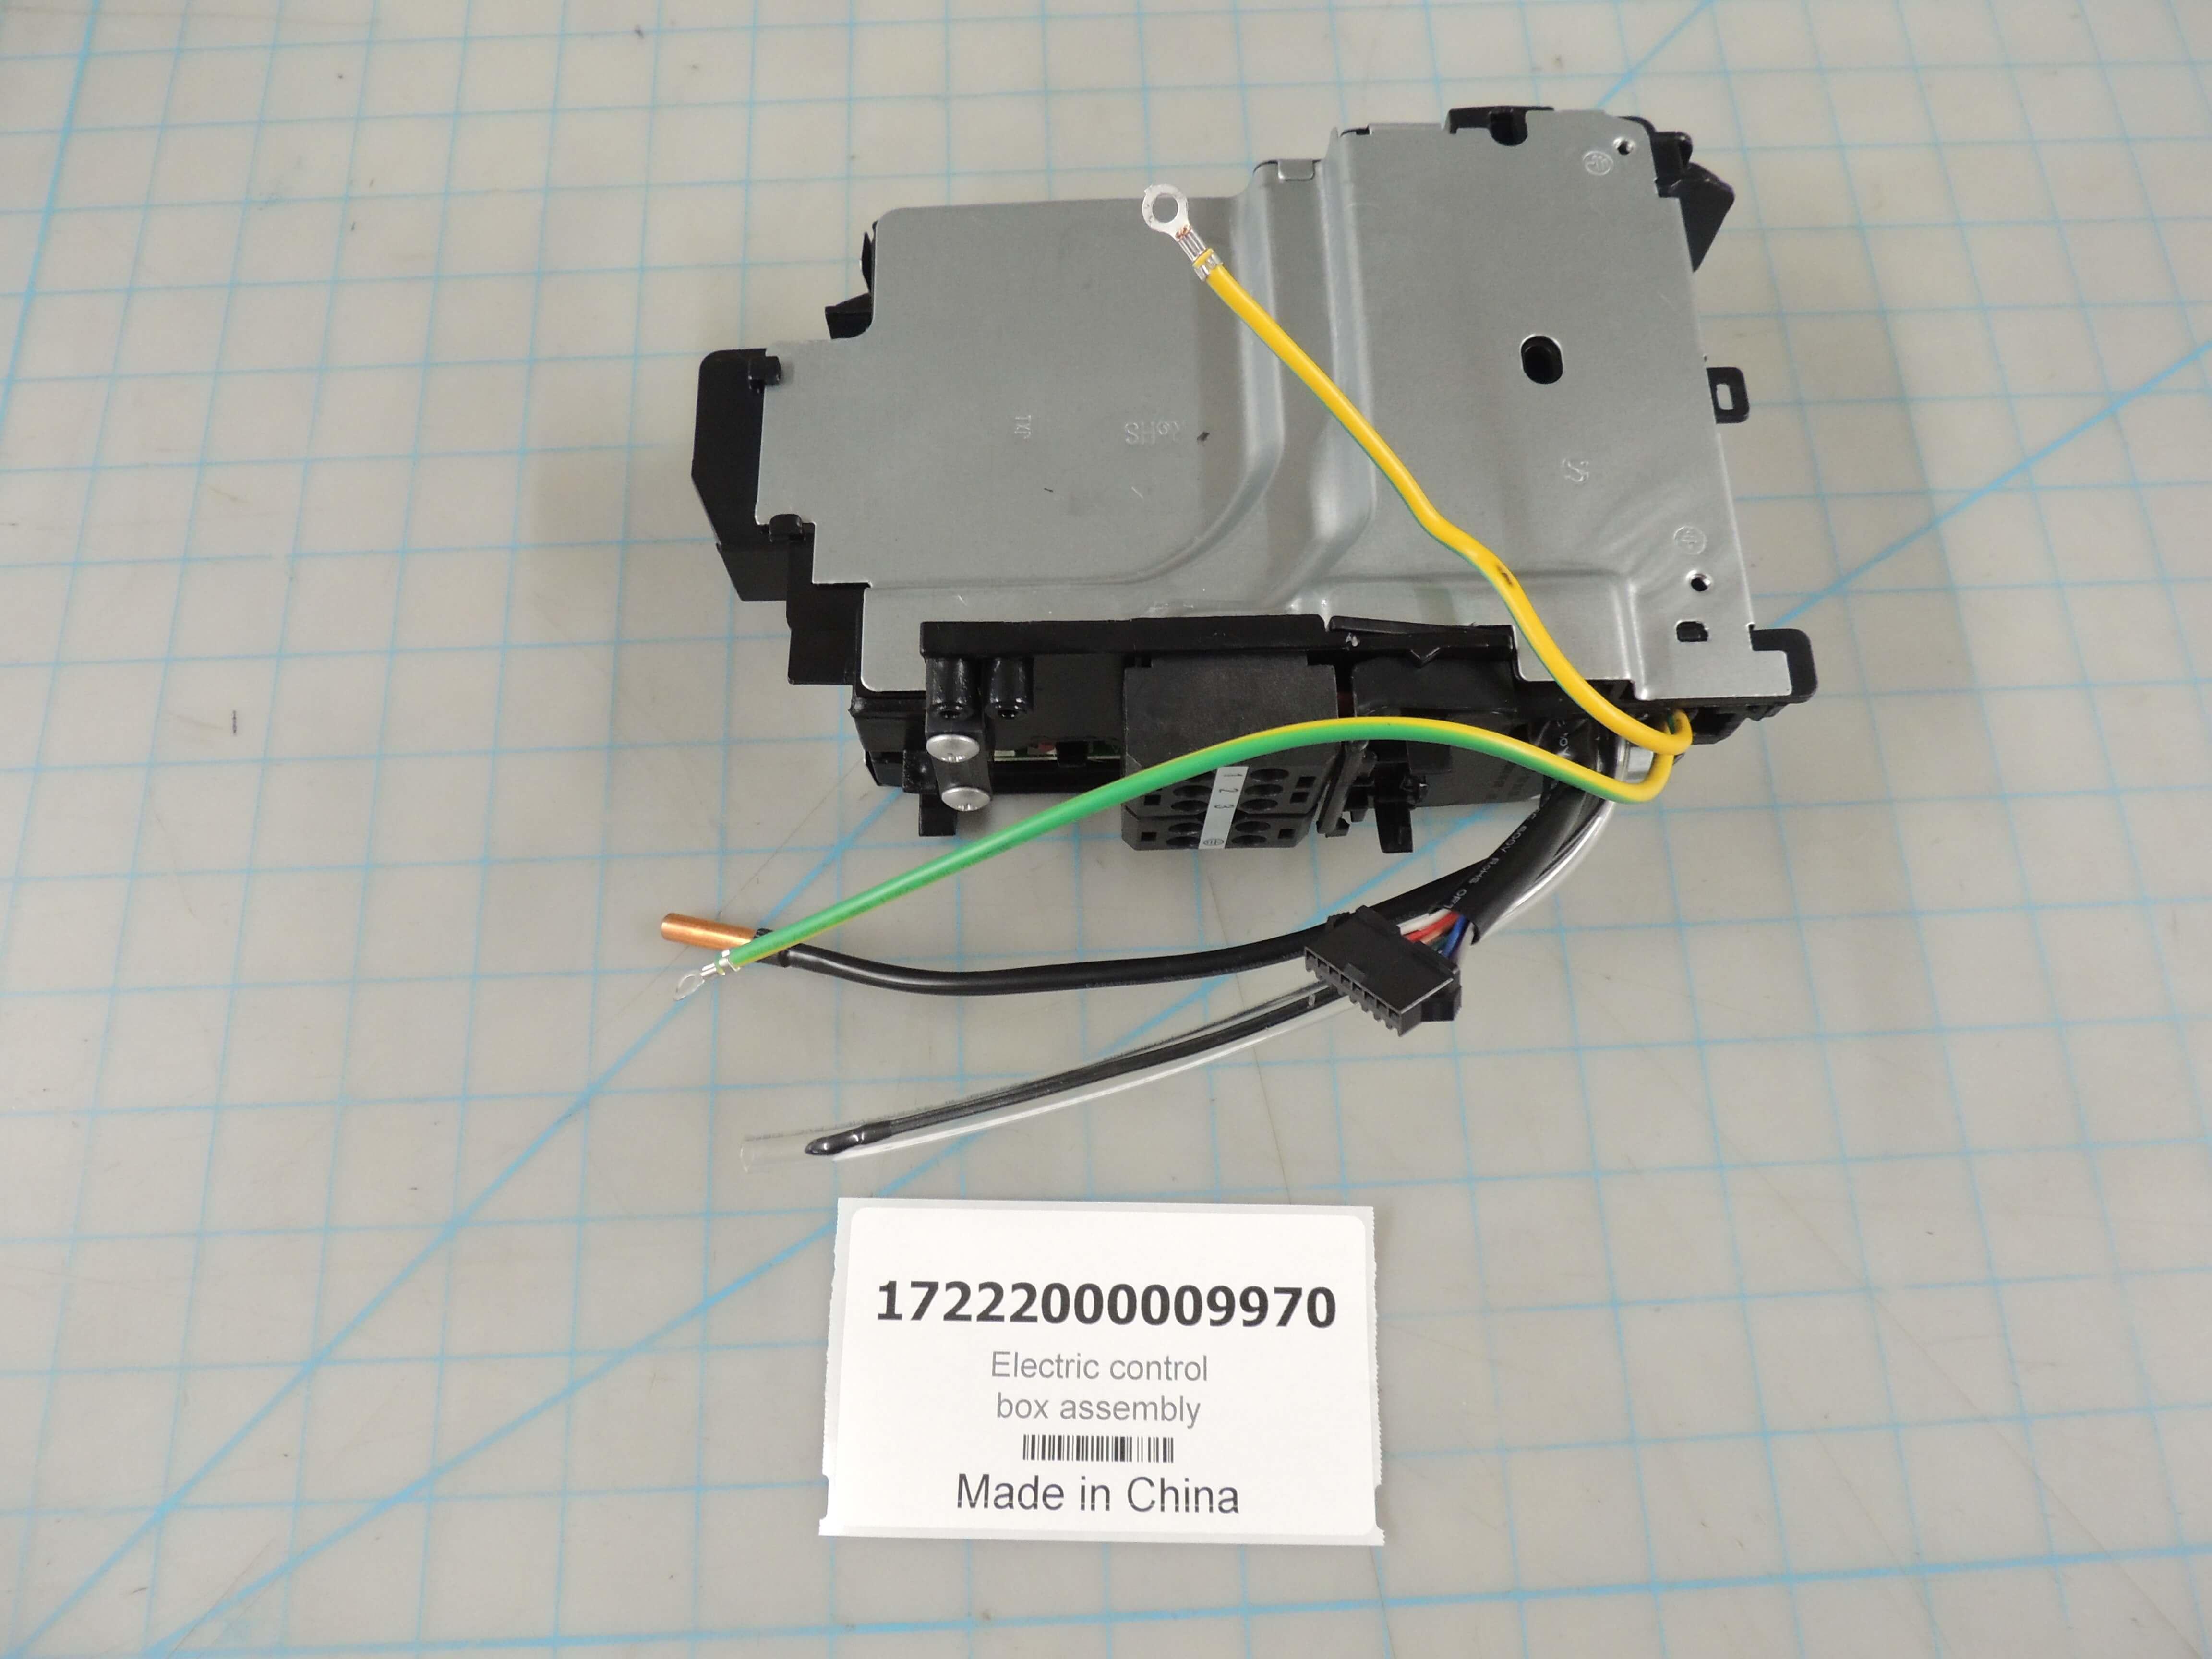 US1-KFR26G/BP3N1Y-ABB(T0)